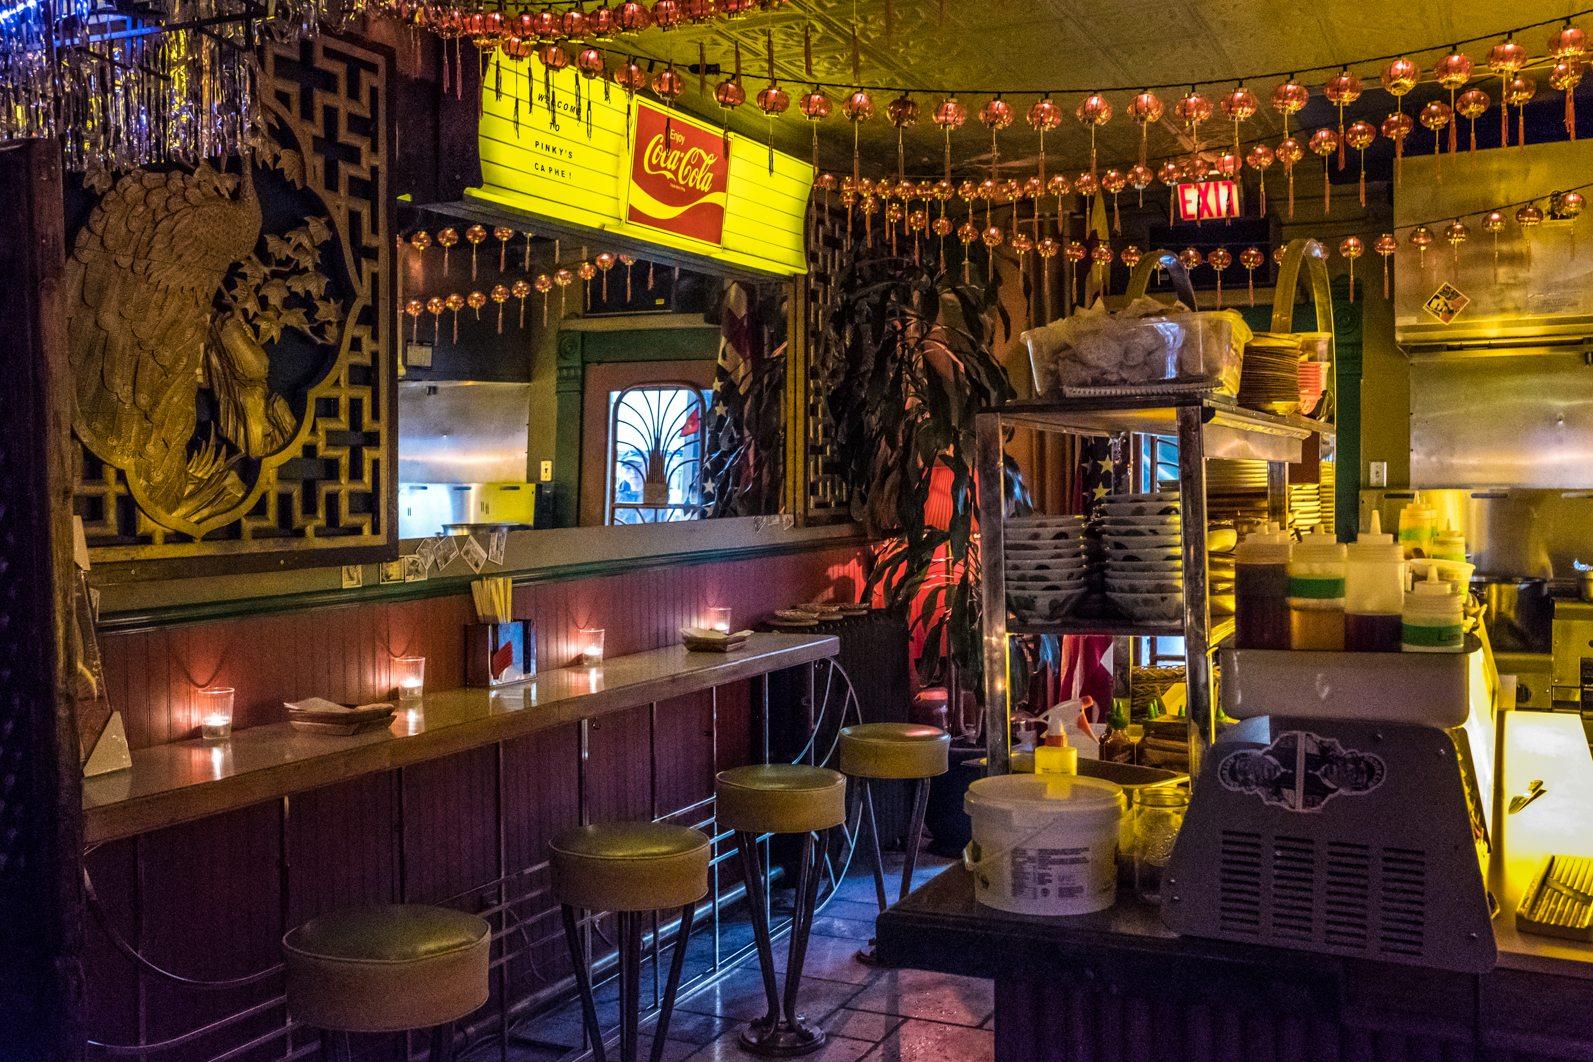 toronto-restaurants-pinkys-ca-phe-vietnamese-cambodian-snack-bar-little-italy-room-8